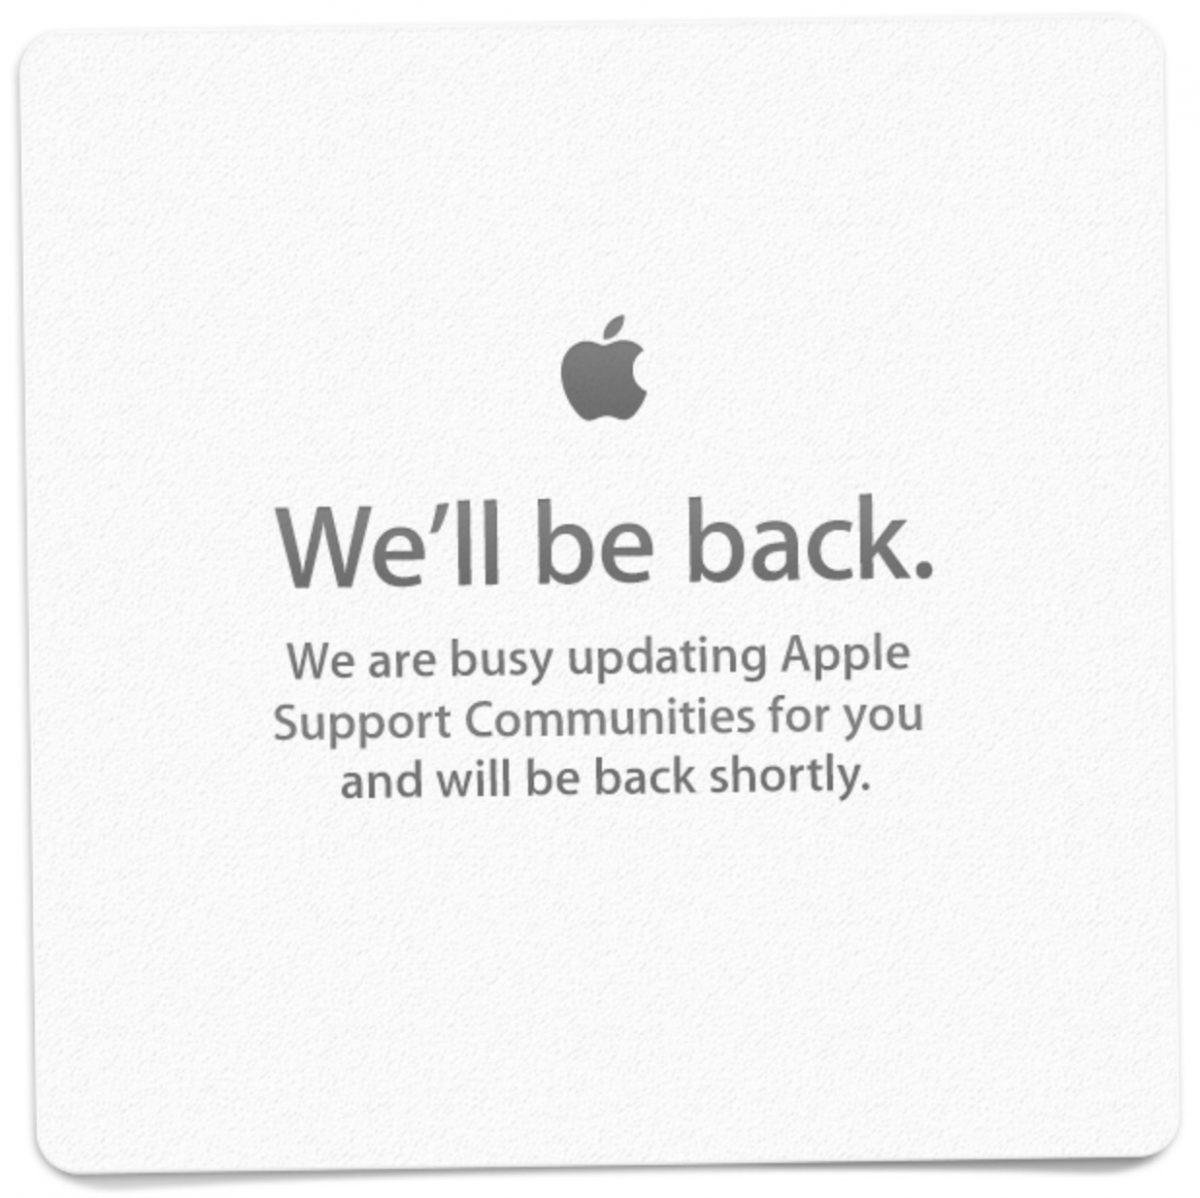 We'll be back.